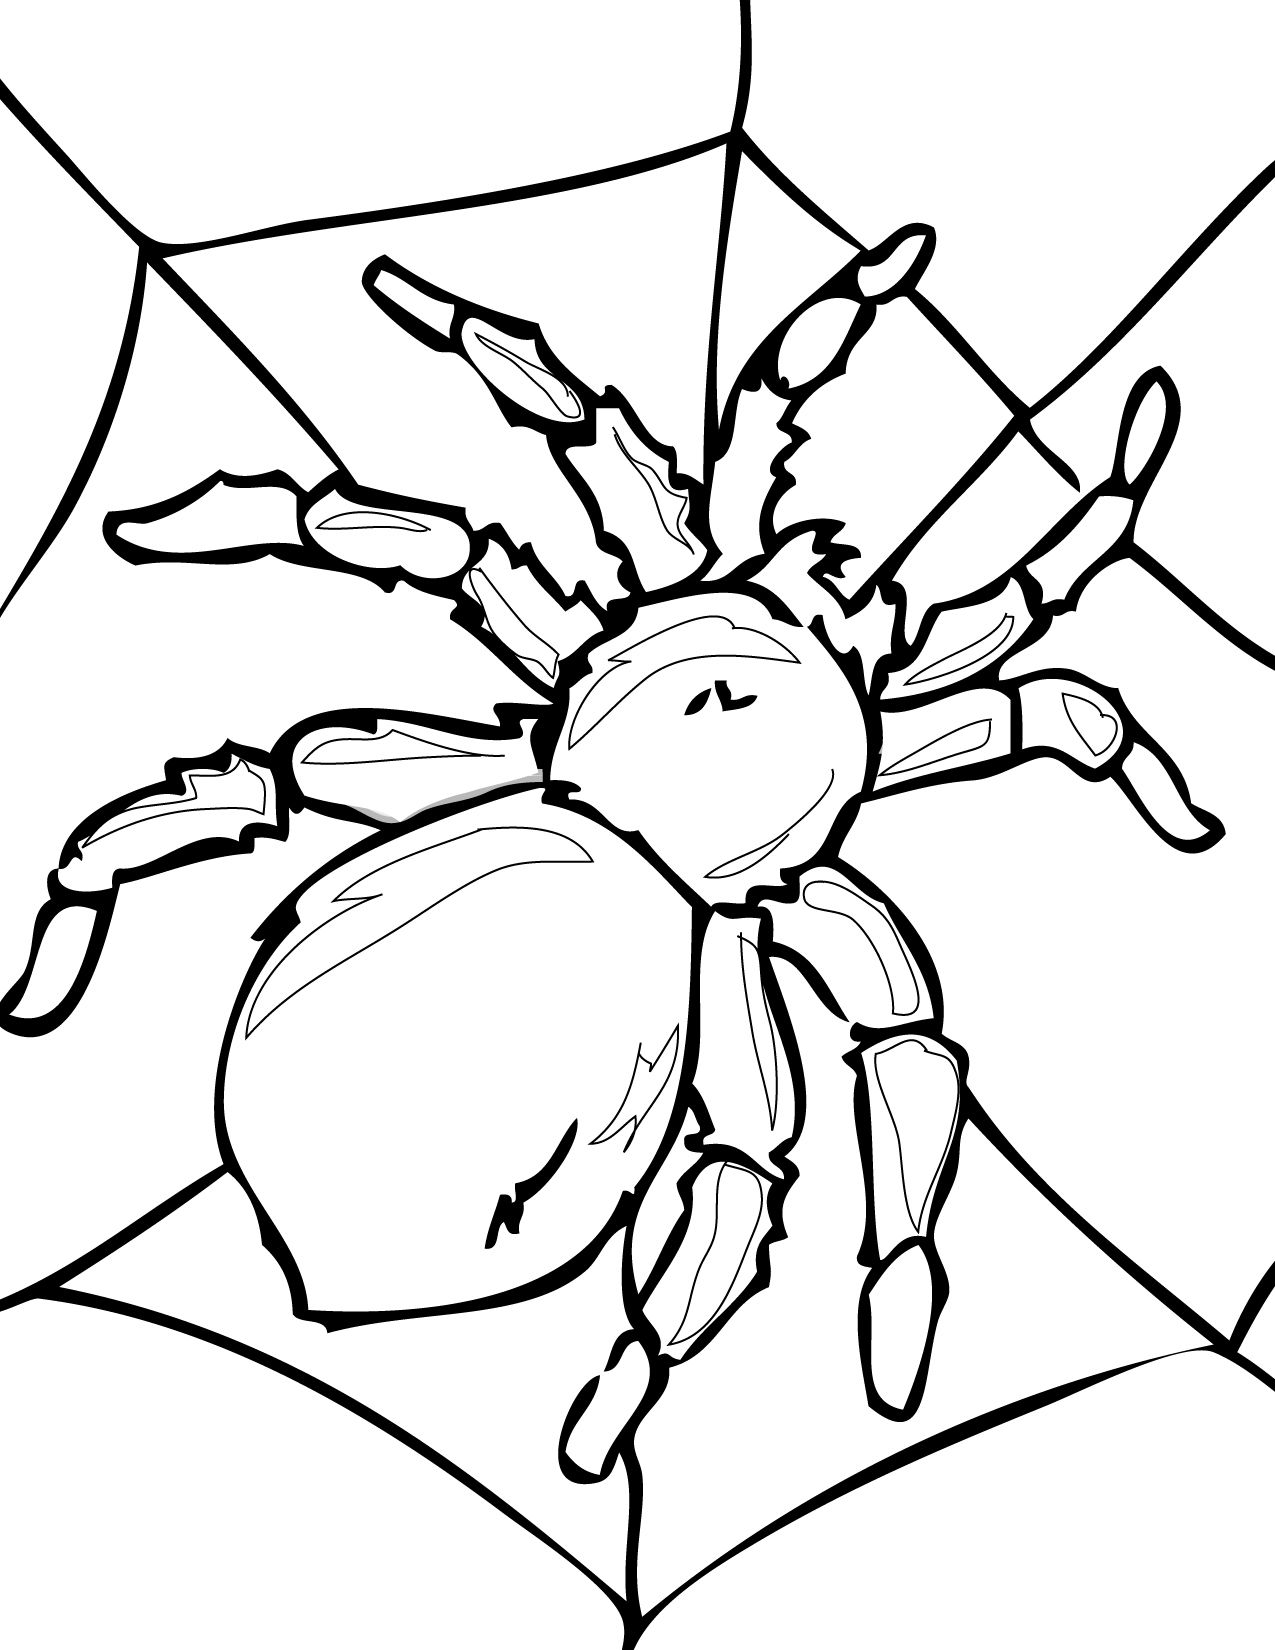 b>Spider</b>-<b>coloring</b>-<b>pages</b>-09 | School Teacher ...